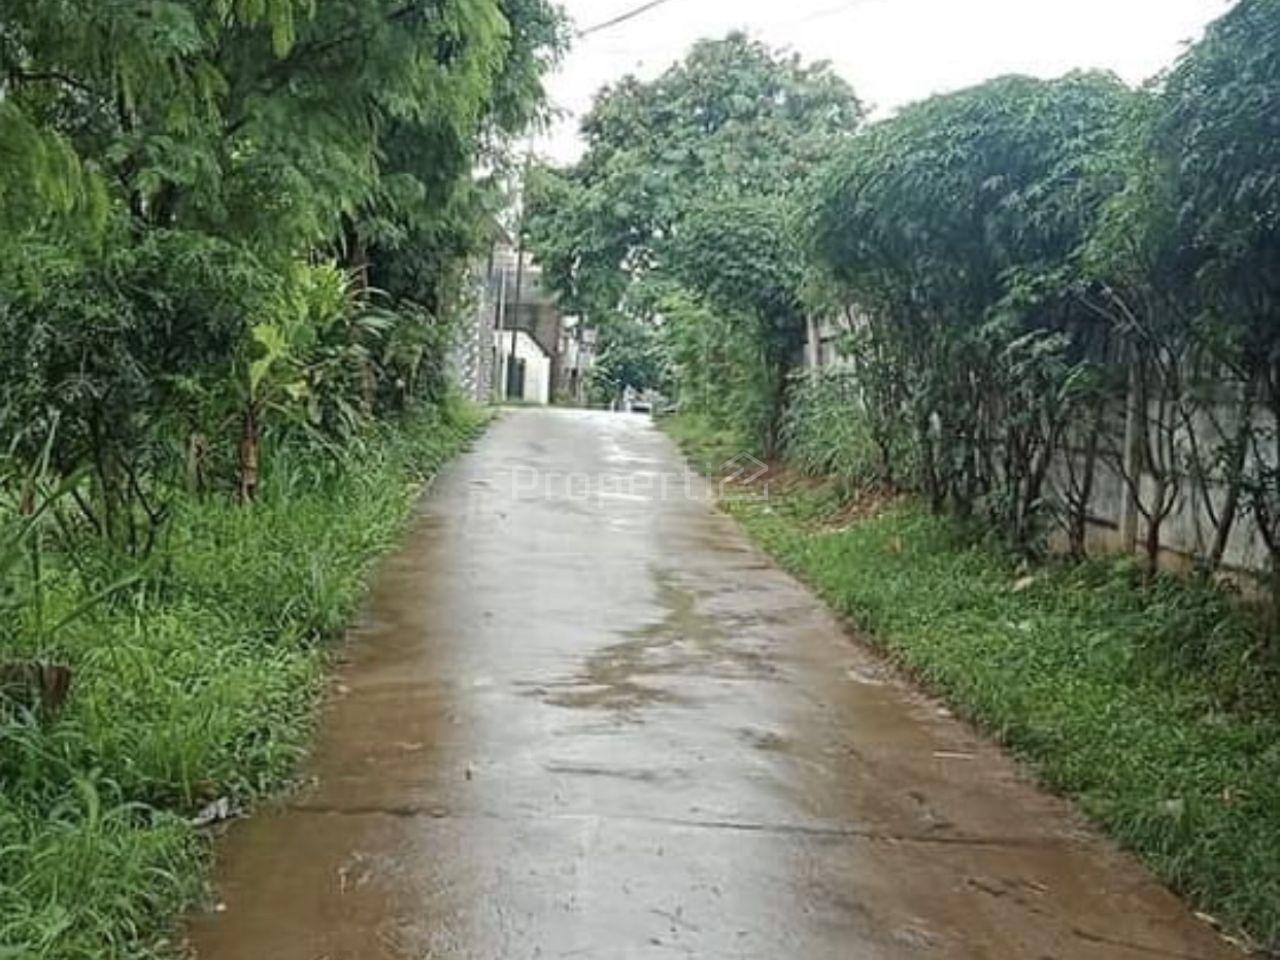 Residential Land at Jatiraden, Bekasi City, Jatisampurna